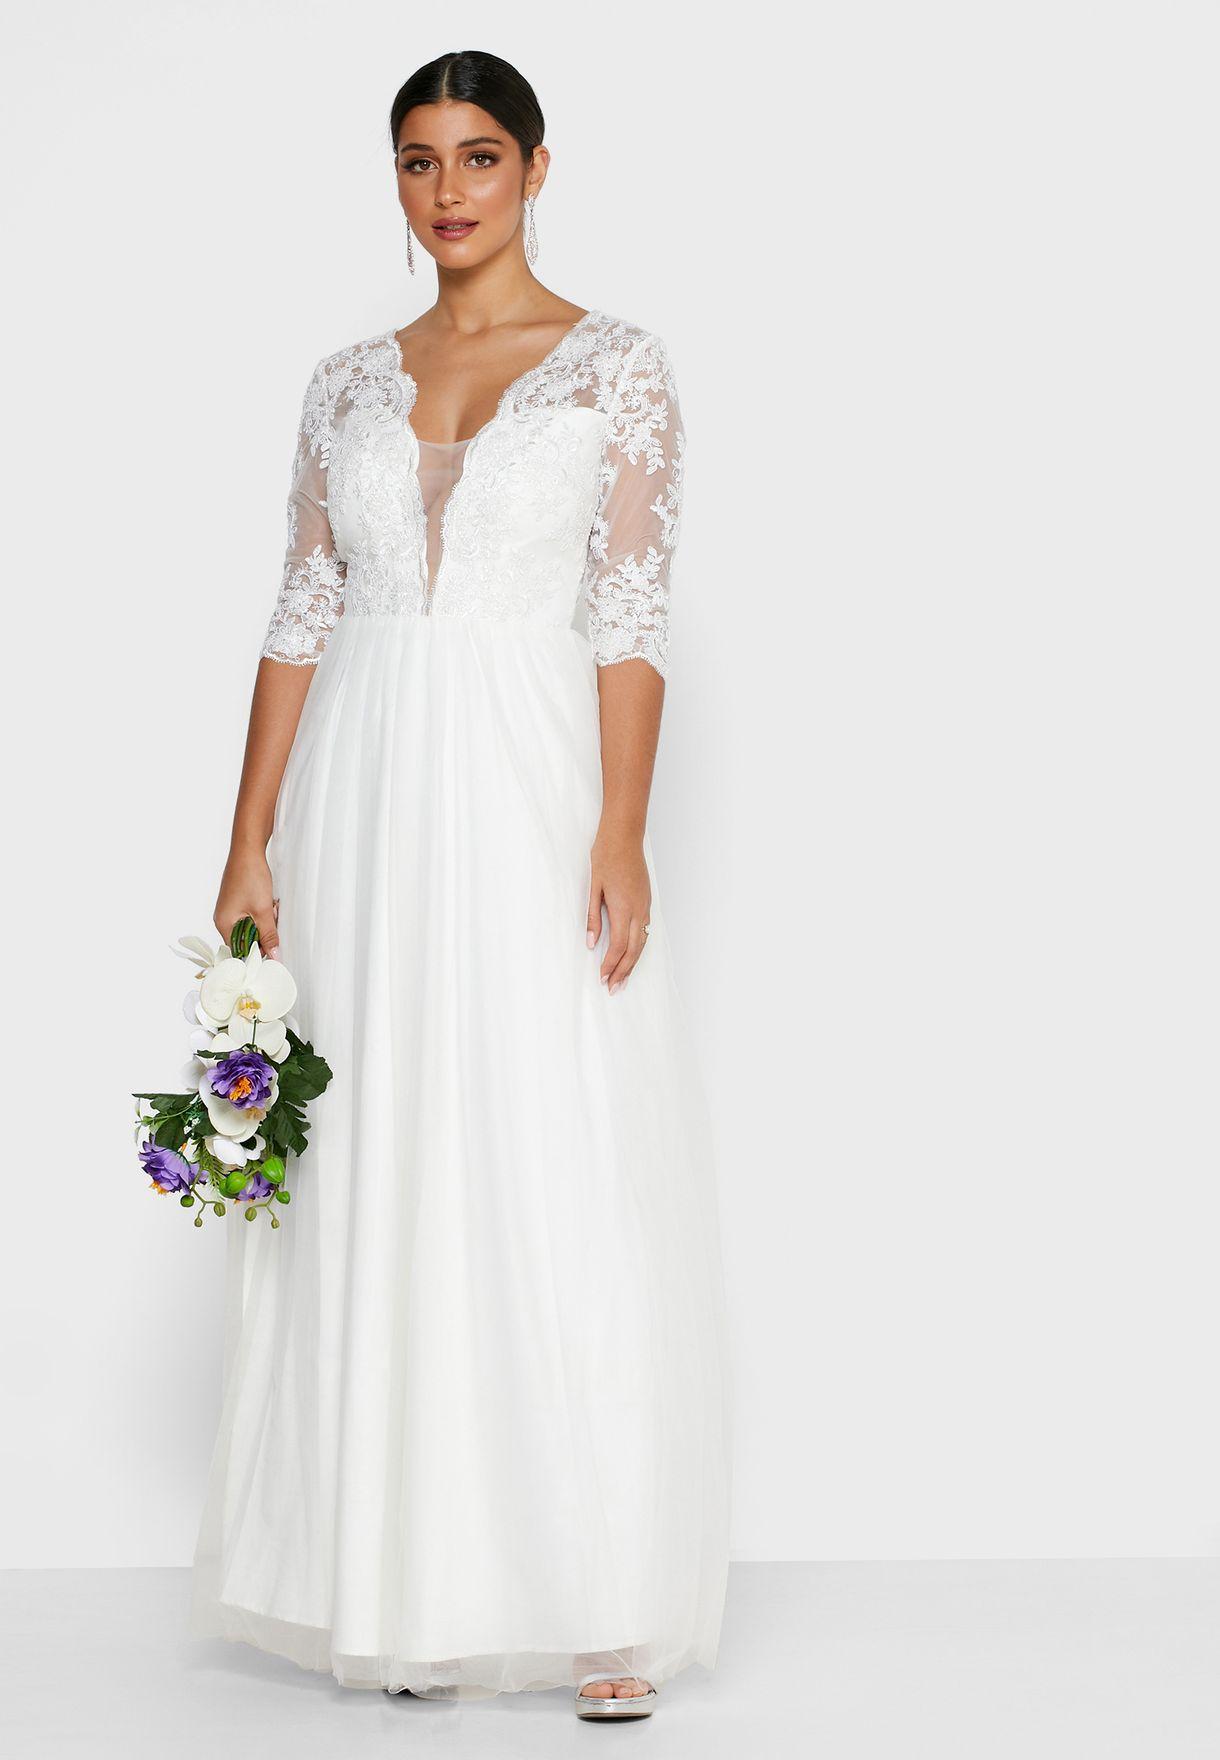 Scallop Detail Lace Dress